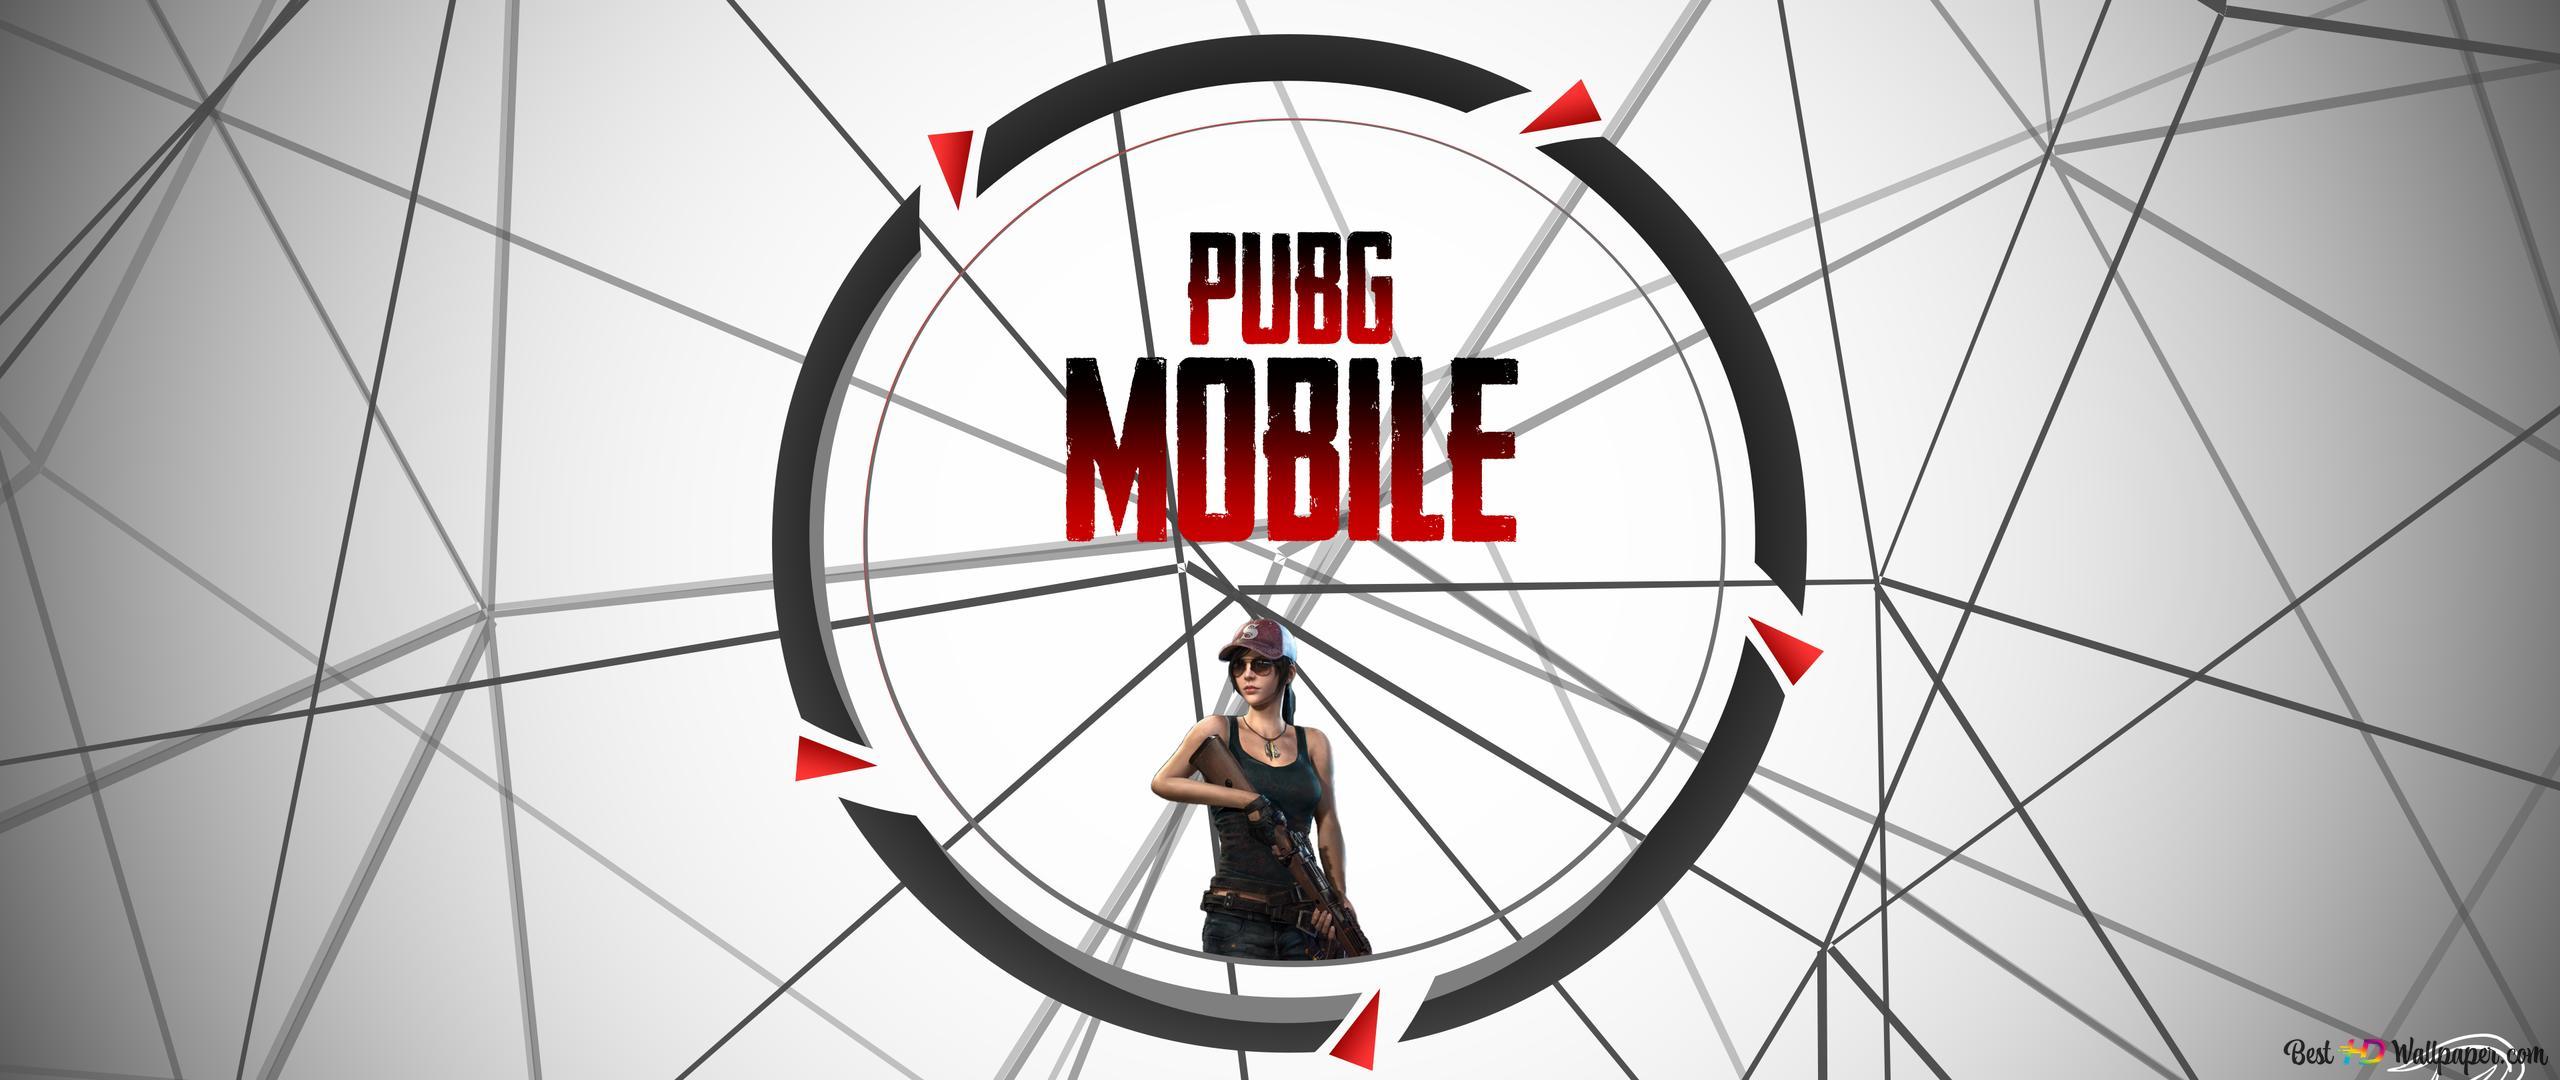 Pubg Mobile Hd Hd Wallpaper Download